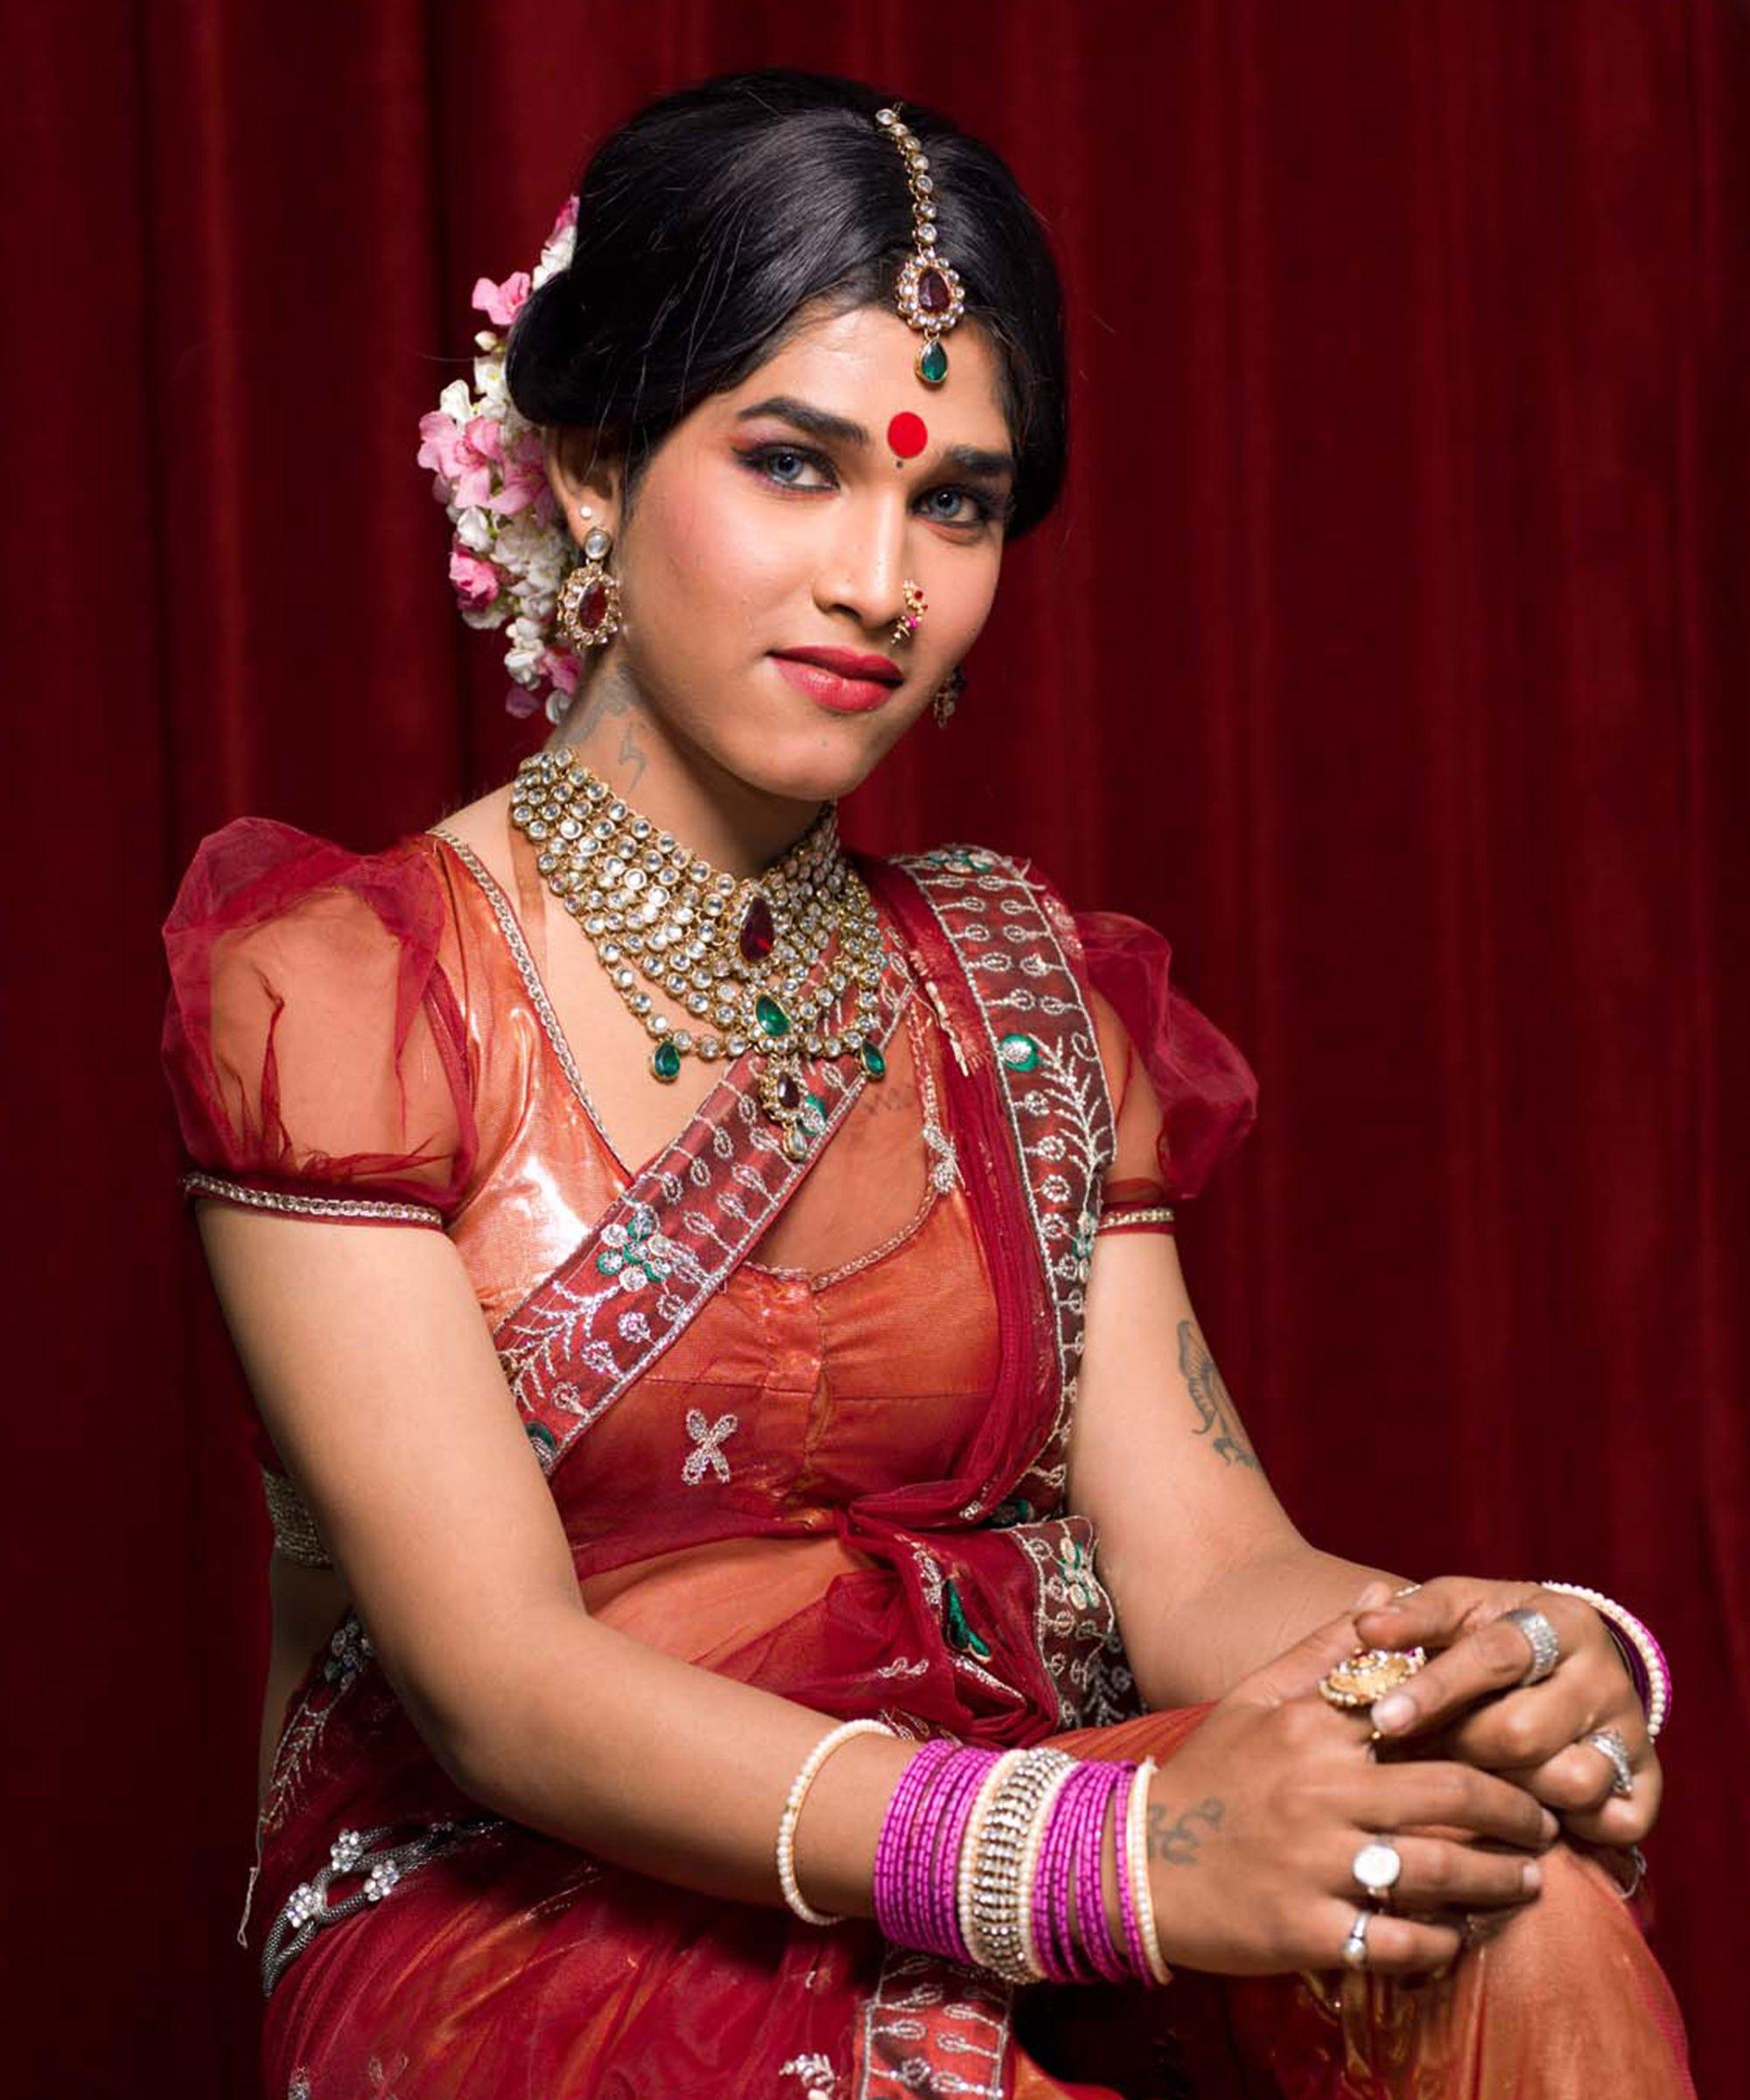 indian hijra sex orgen image